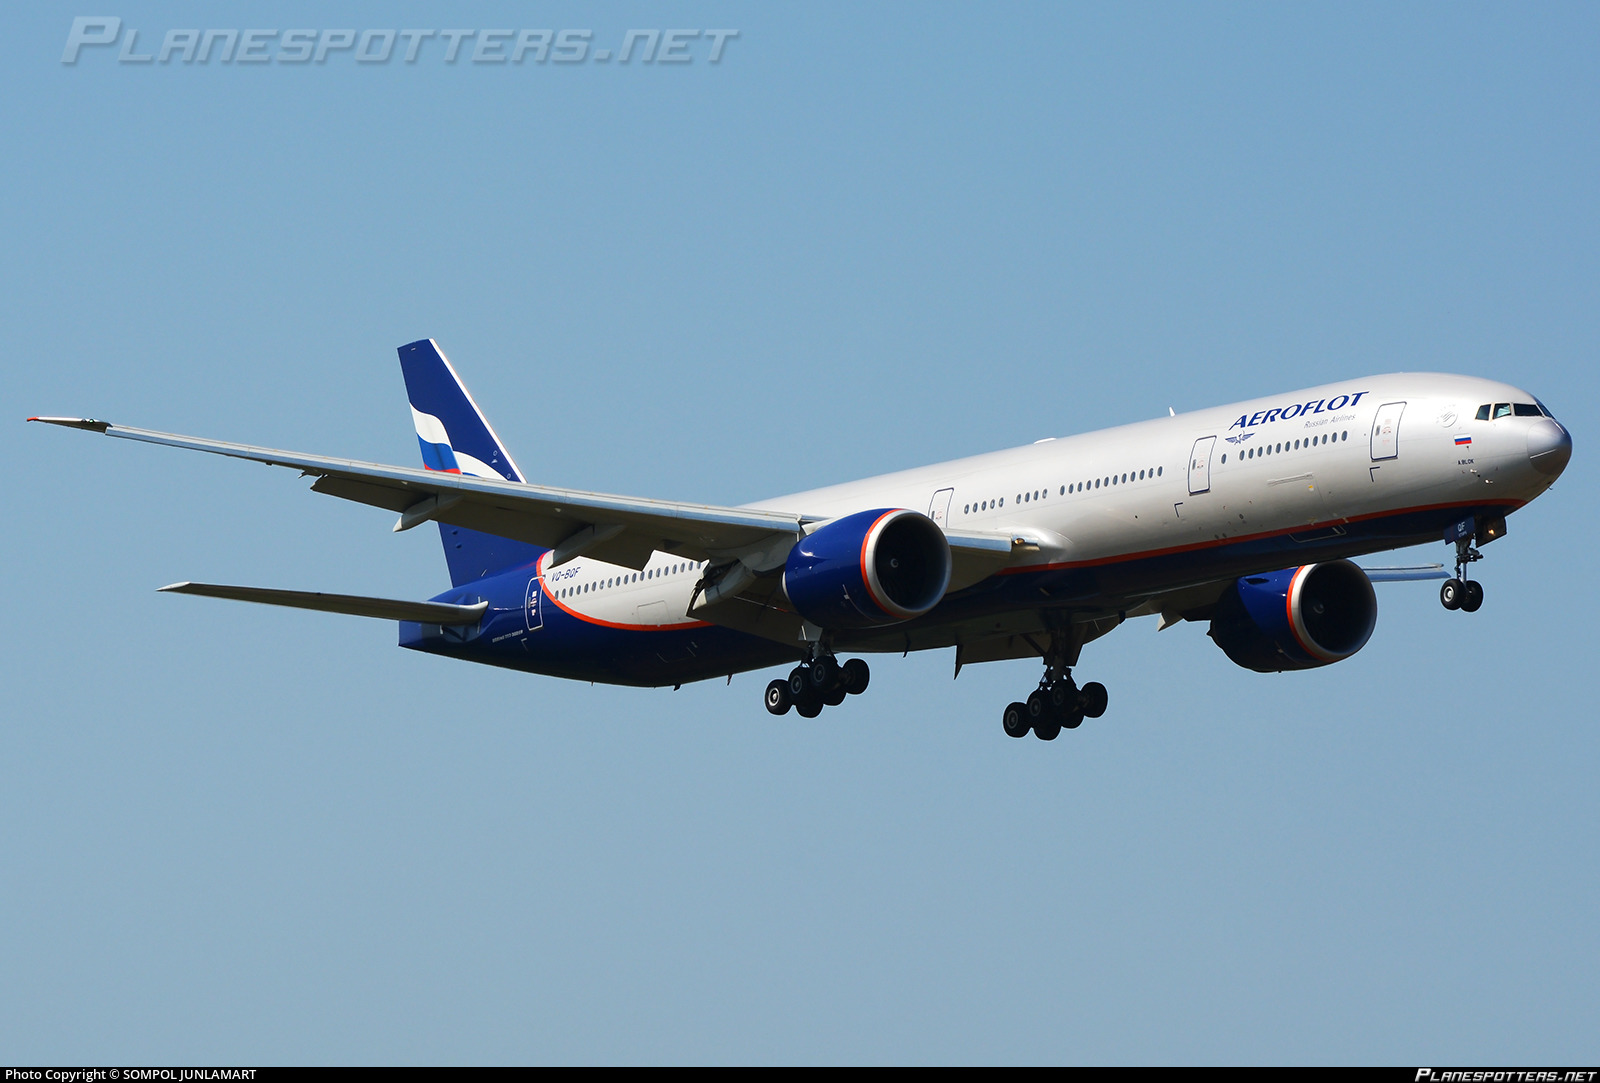 VQ-BQF Aeroflot - Russian Airlines Boeing 777-3M0(ER) photographed at Bangkok Suvarnabhumi (BKK / VTBS) by SOMPOL JUNLAMART